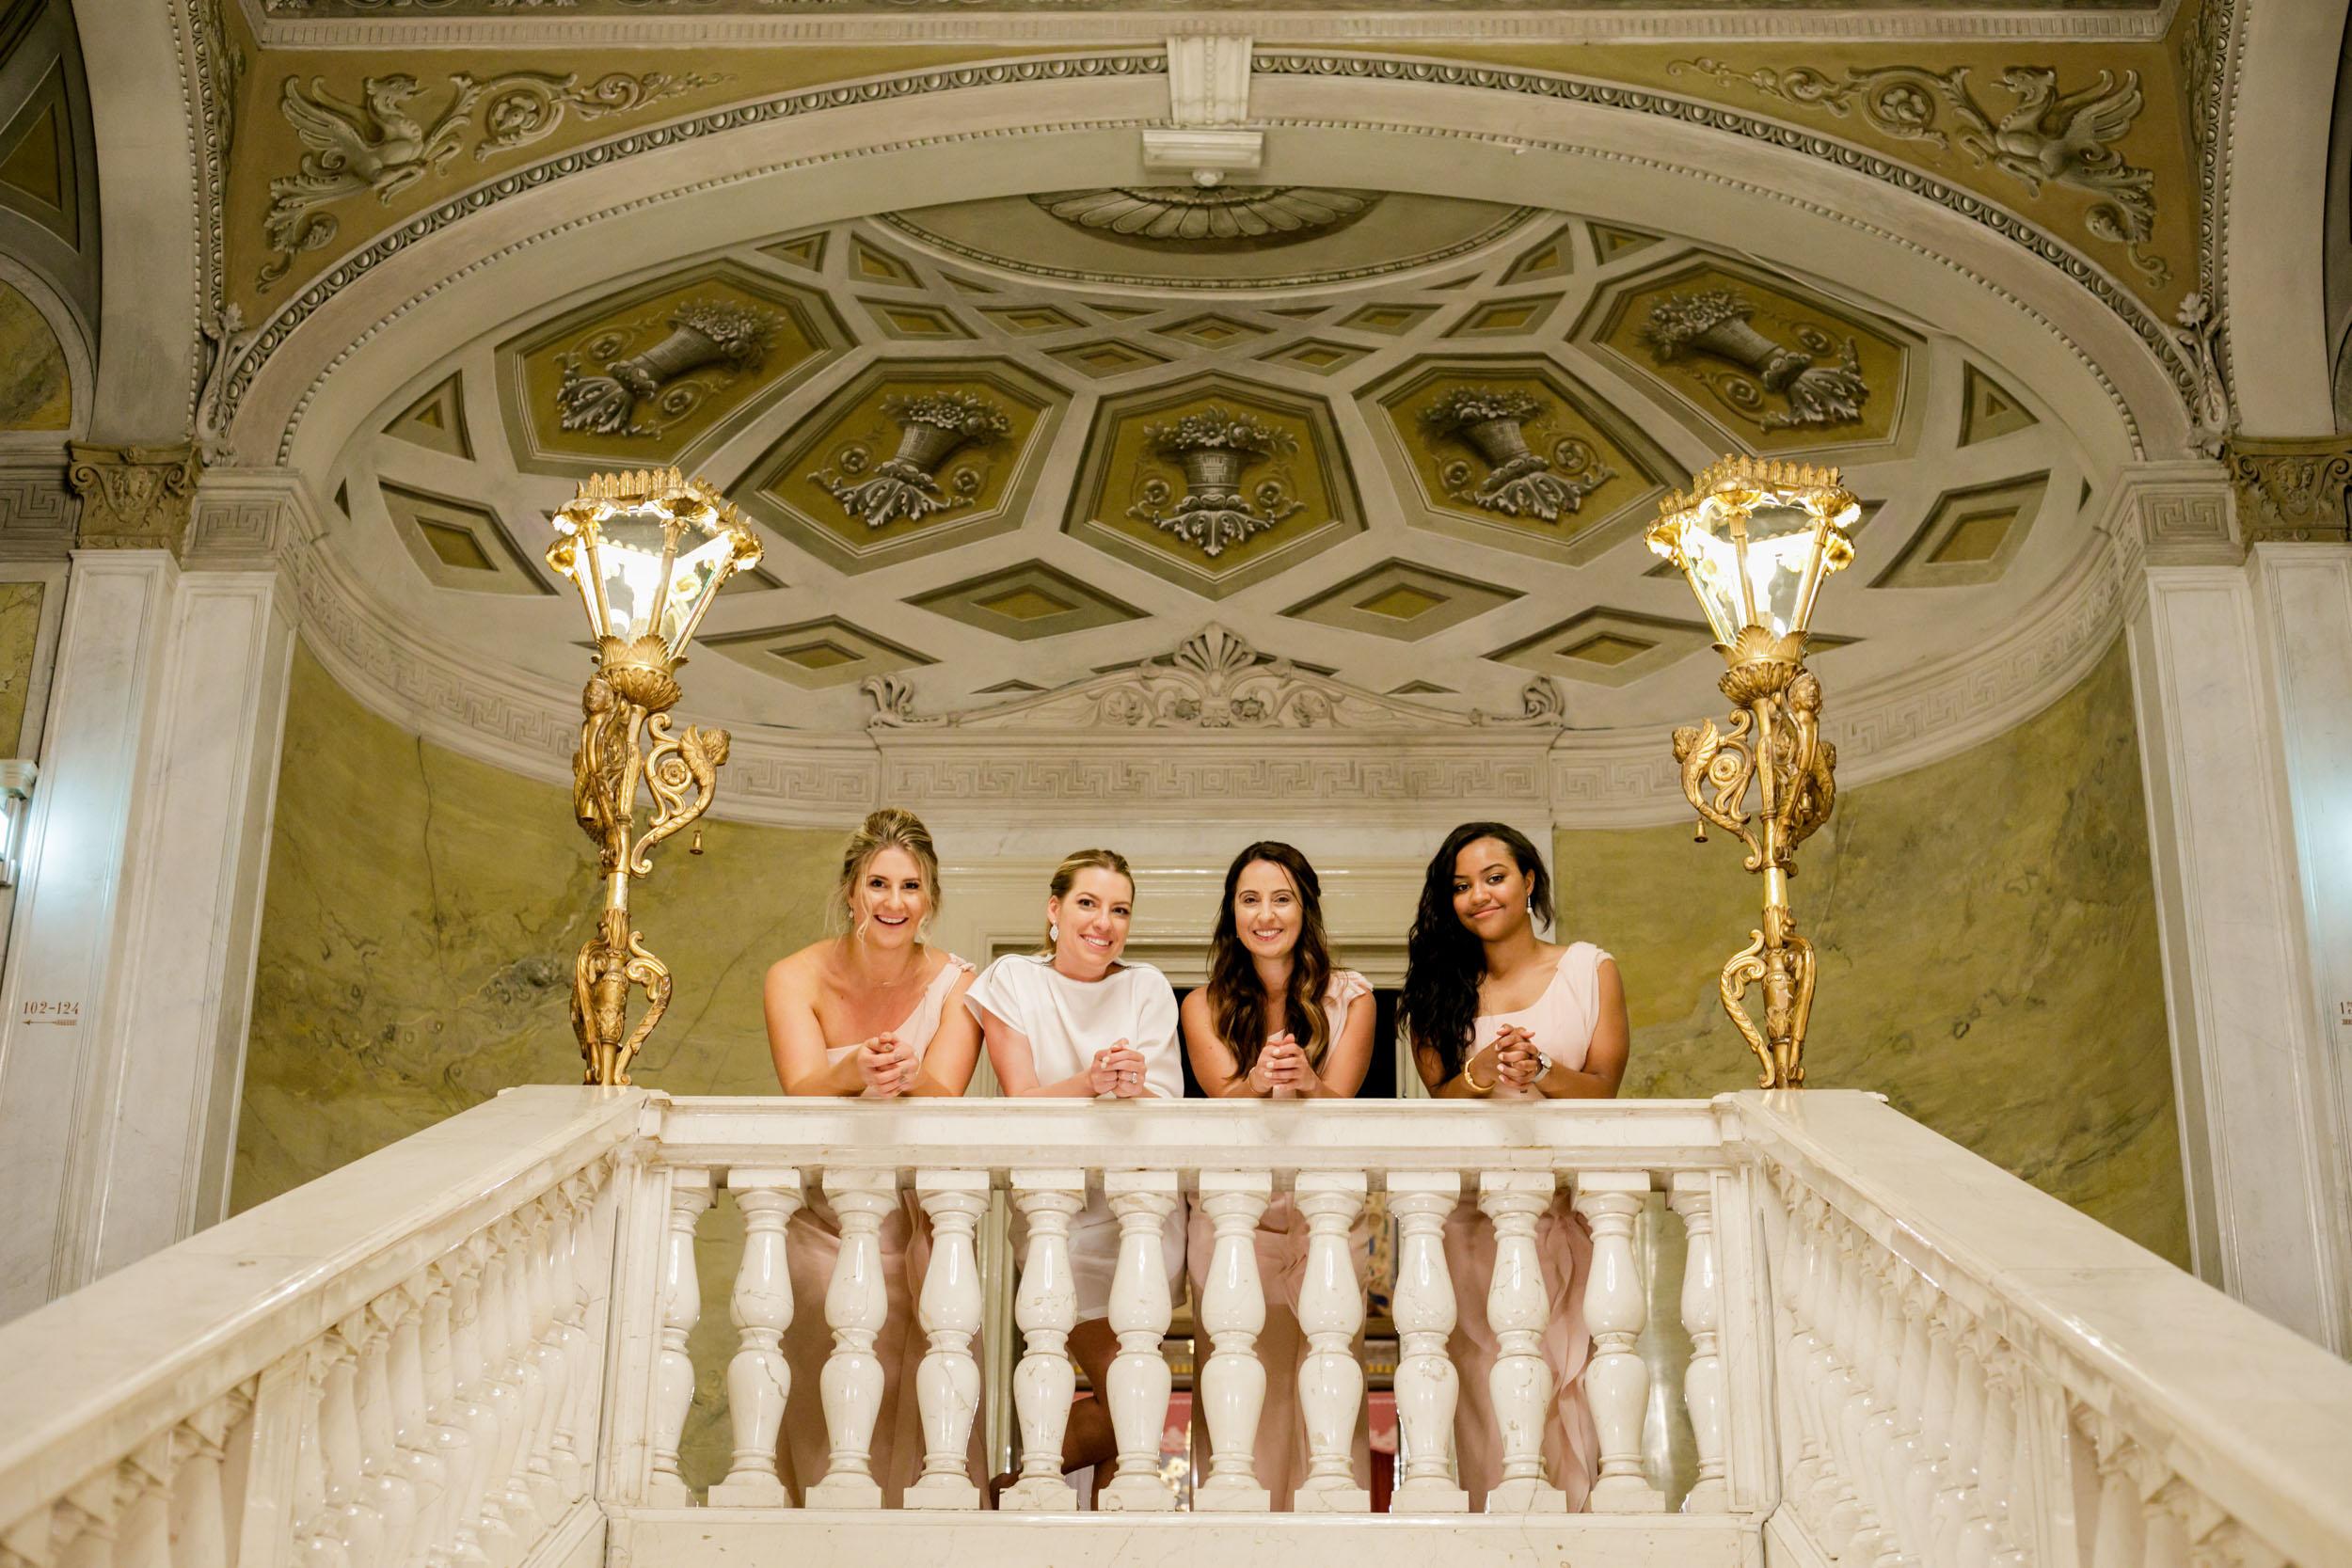 Luxury Lake Como Wedding Grand Hotel Villa Serbelloni Bellagio Photographer Bojan Hohnjec